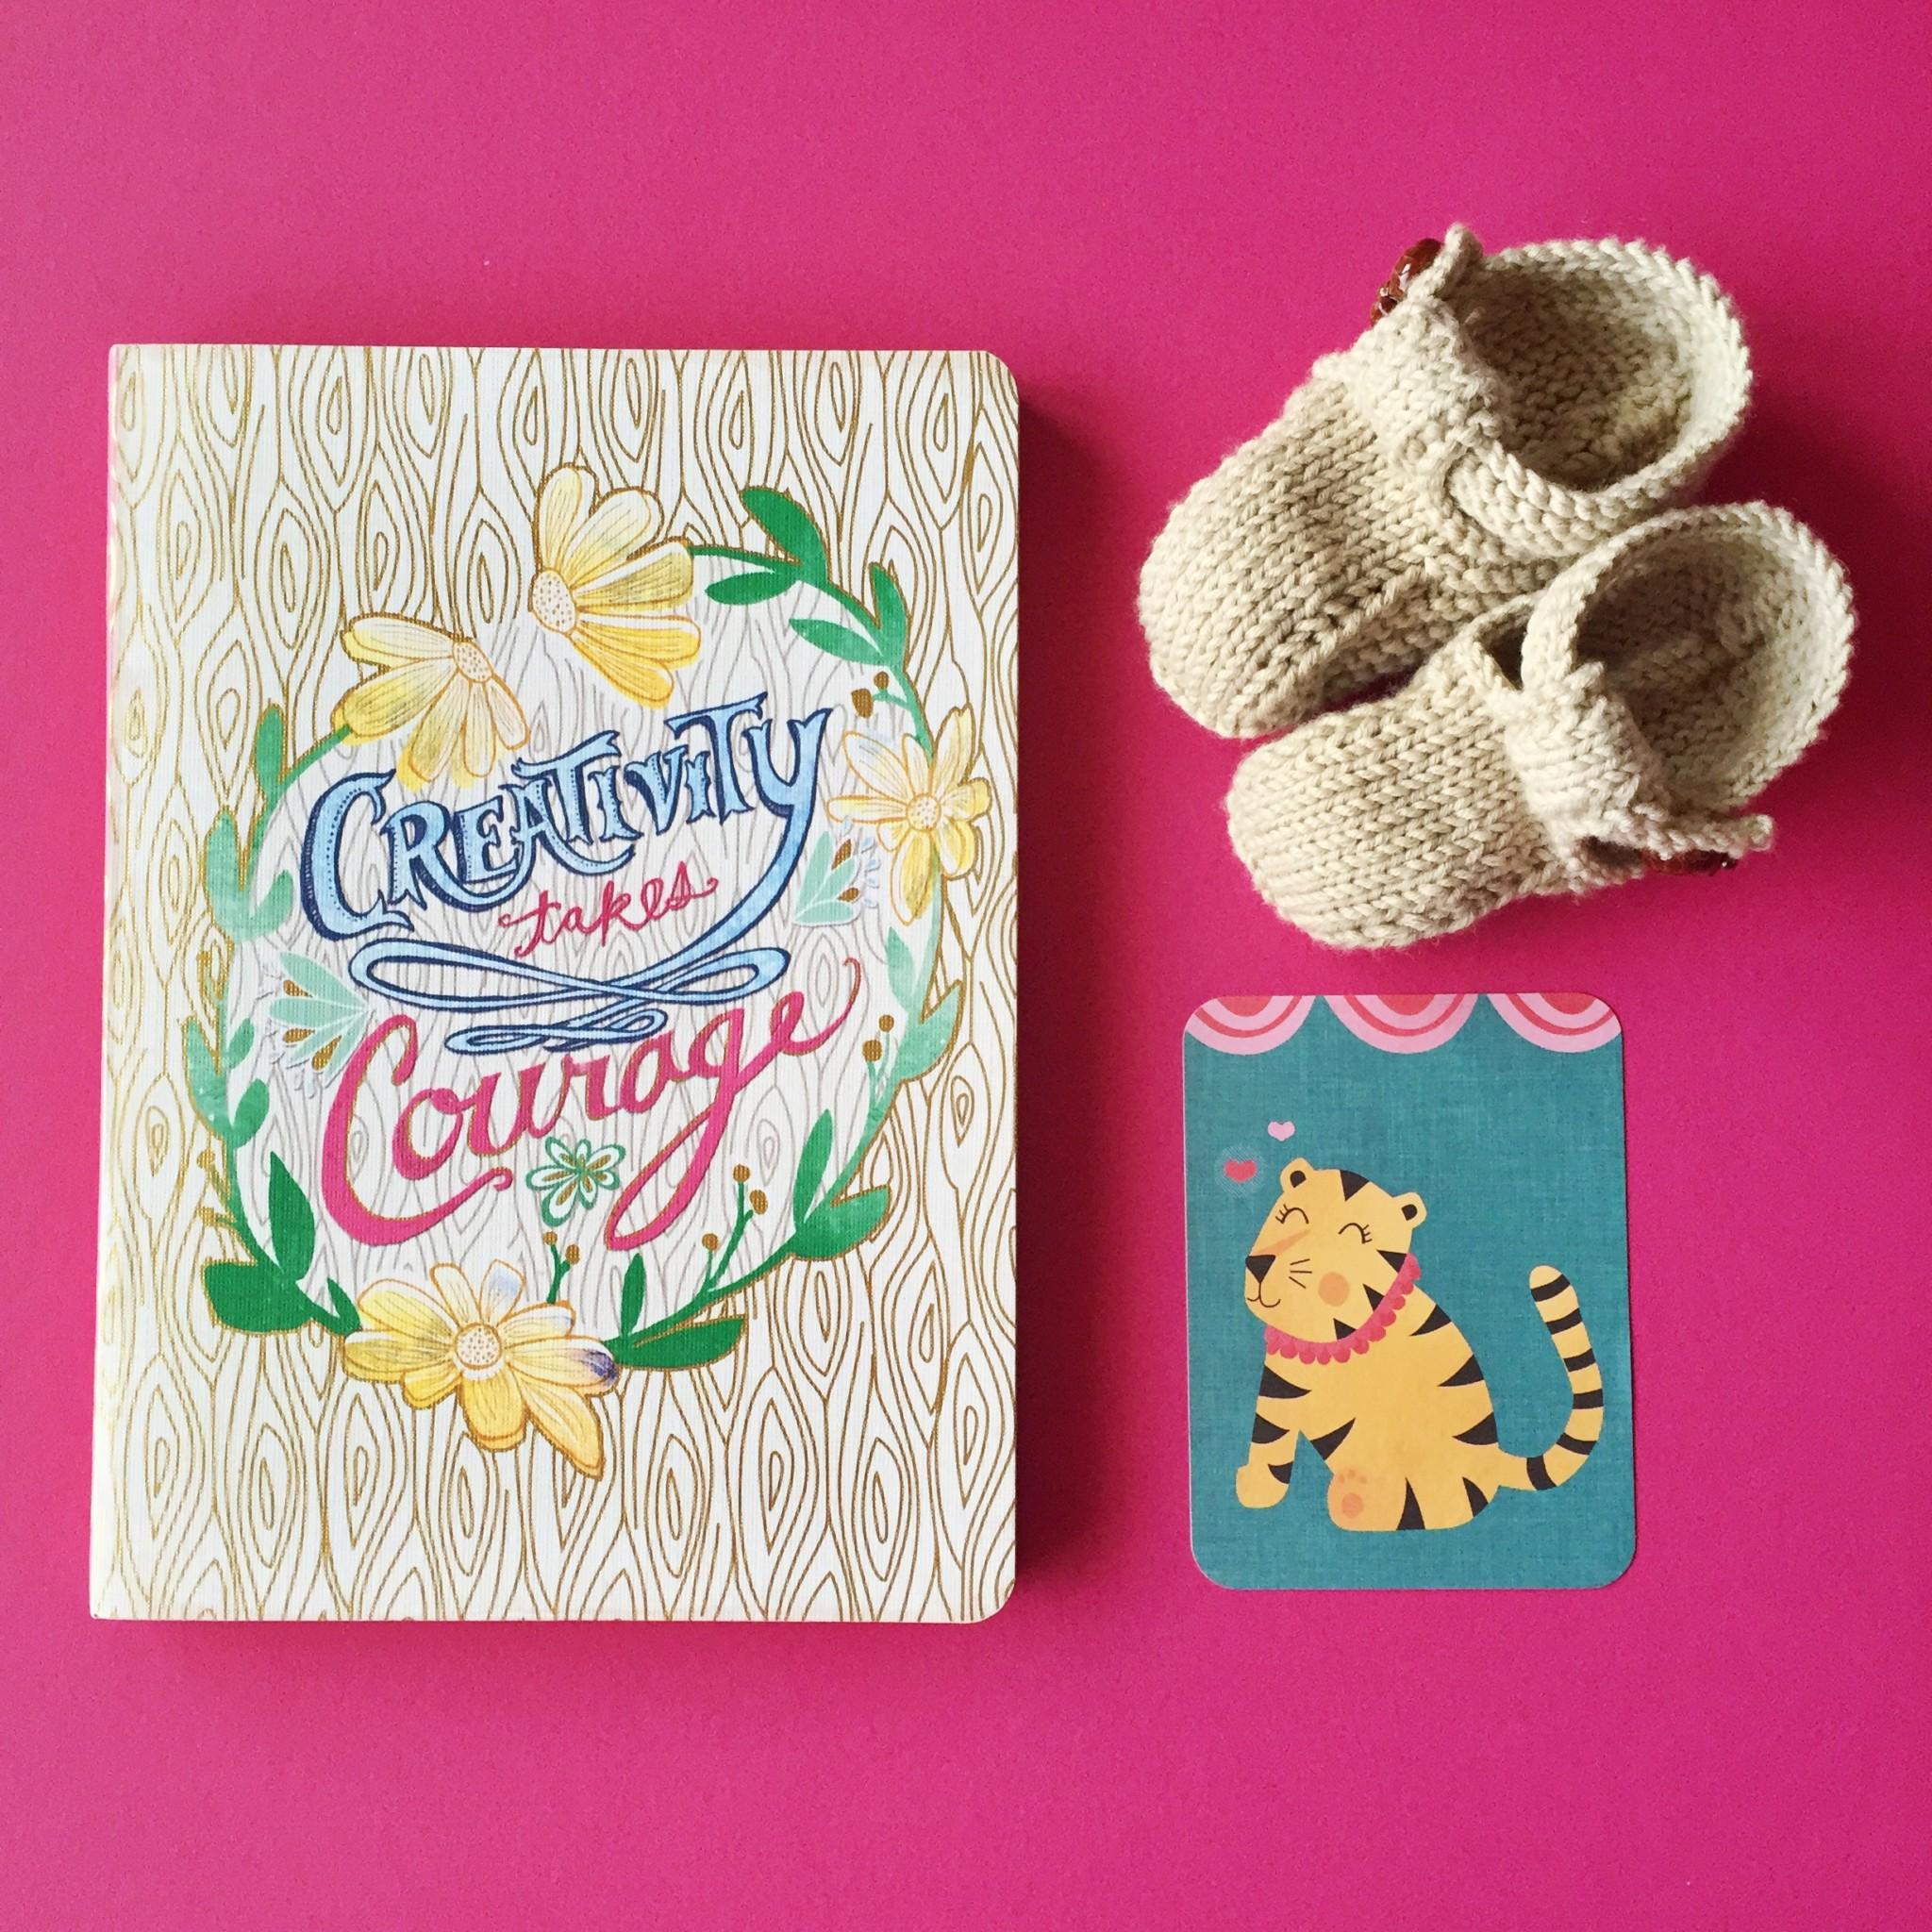 Creativity takes courage | Hello! Hooray!